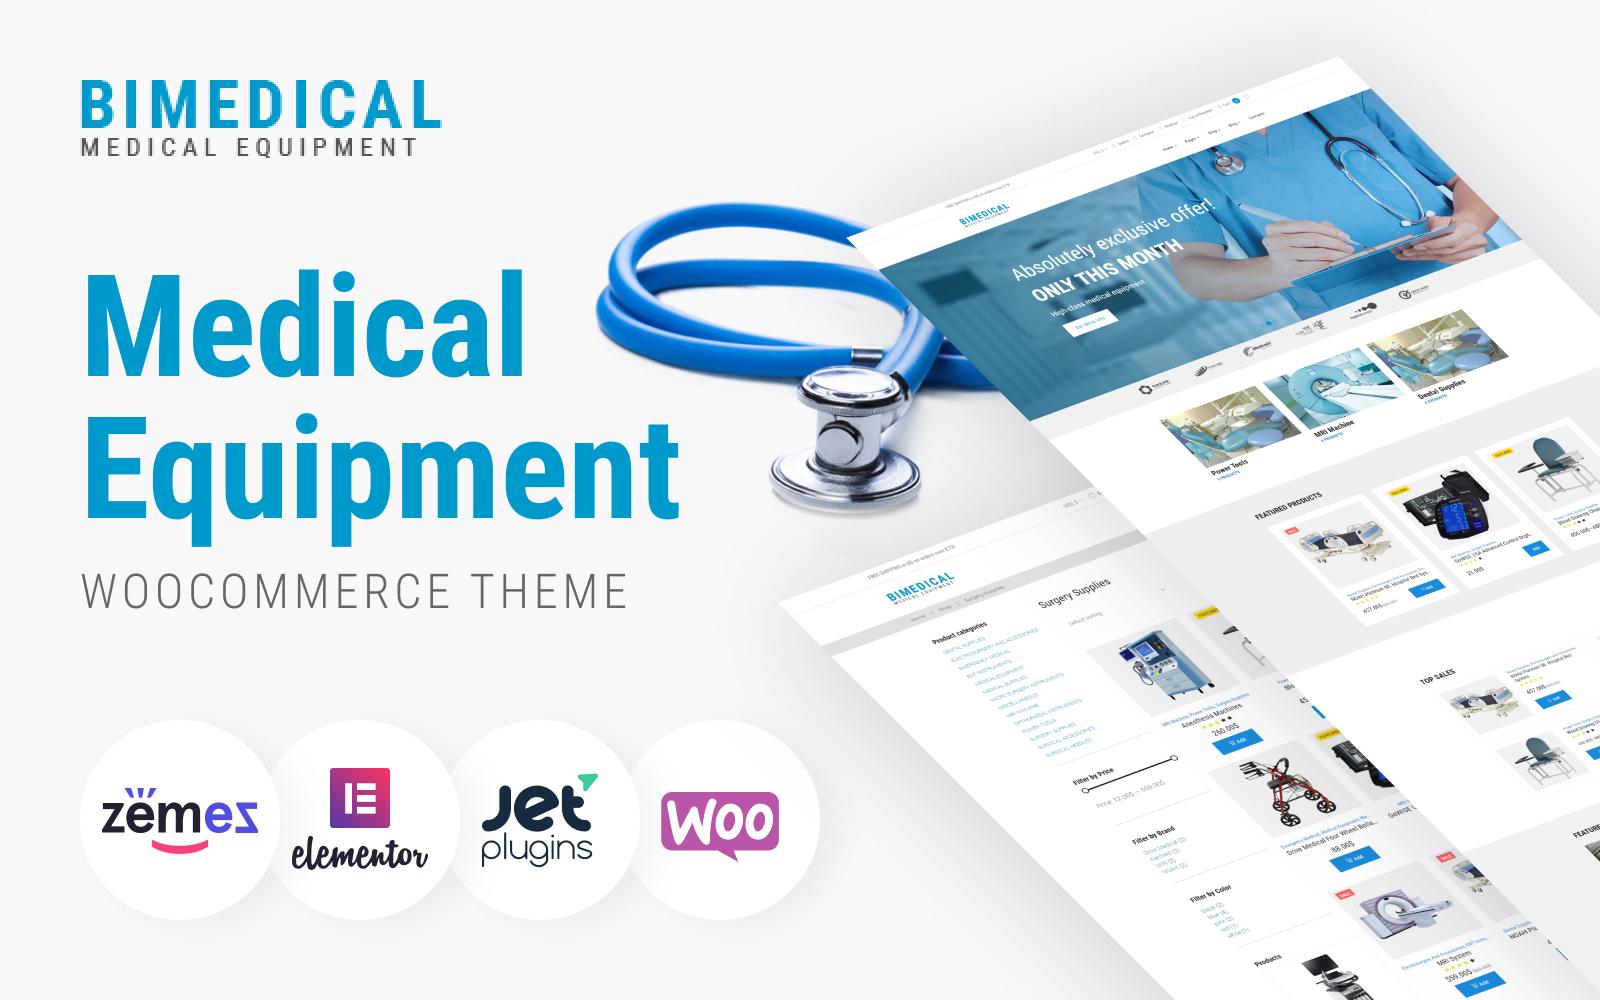 Bimedical- Medical Equipment Responsive №64363